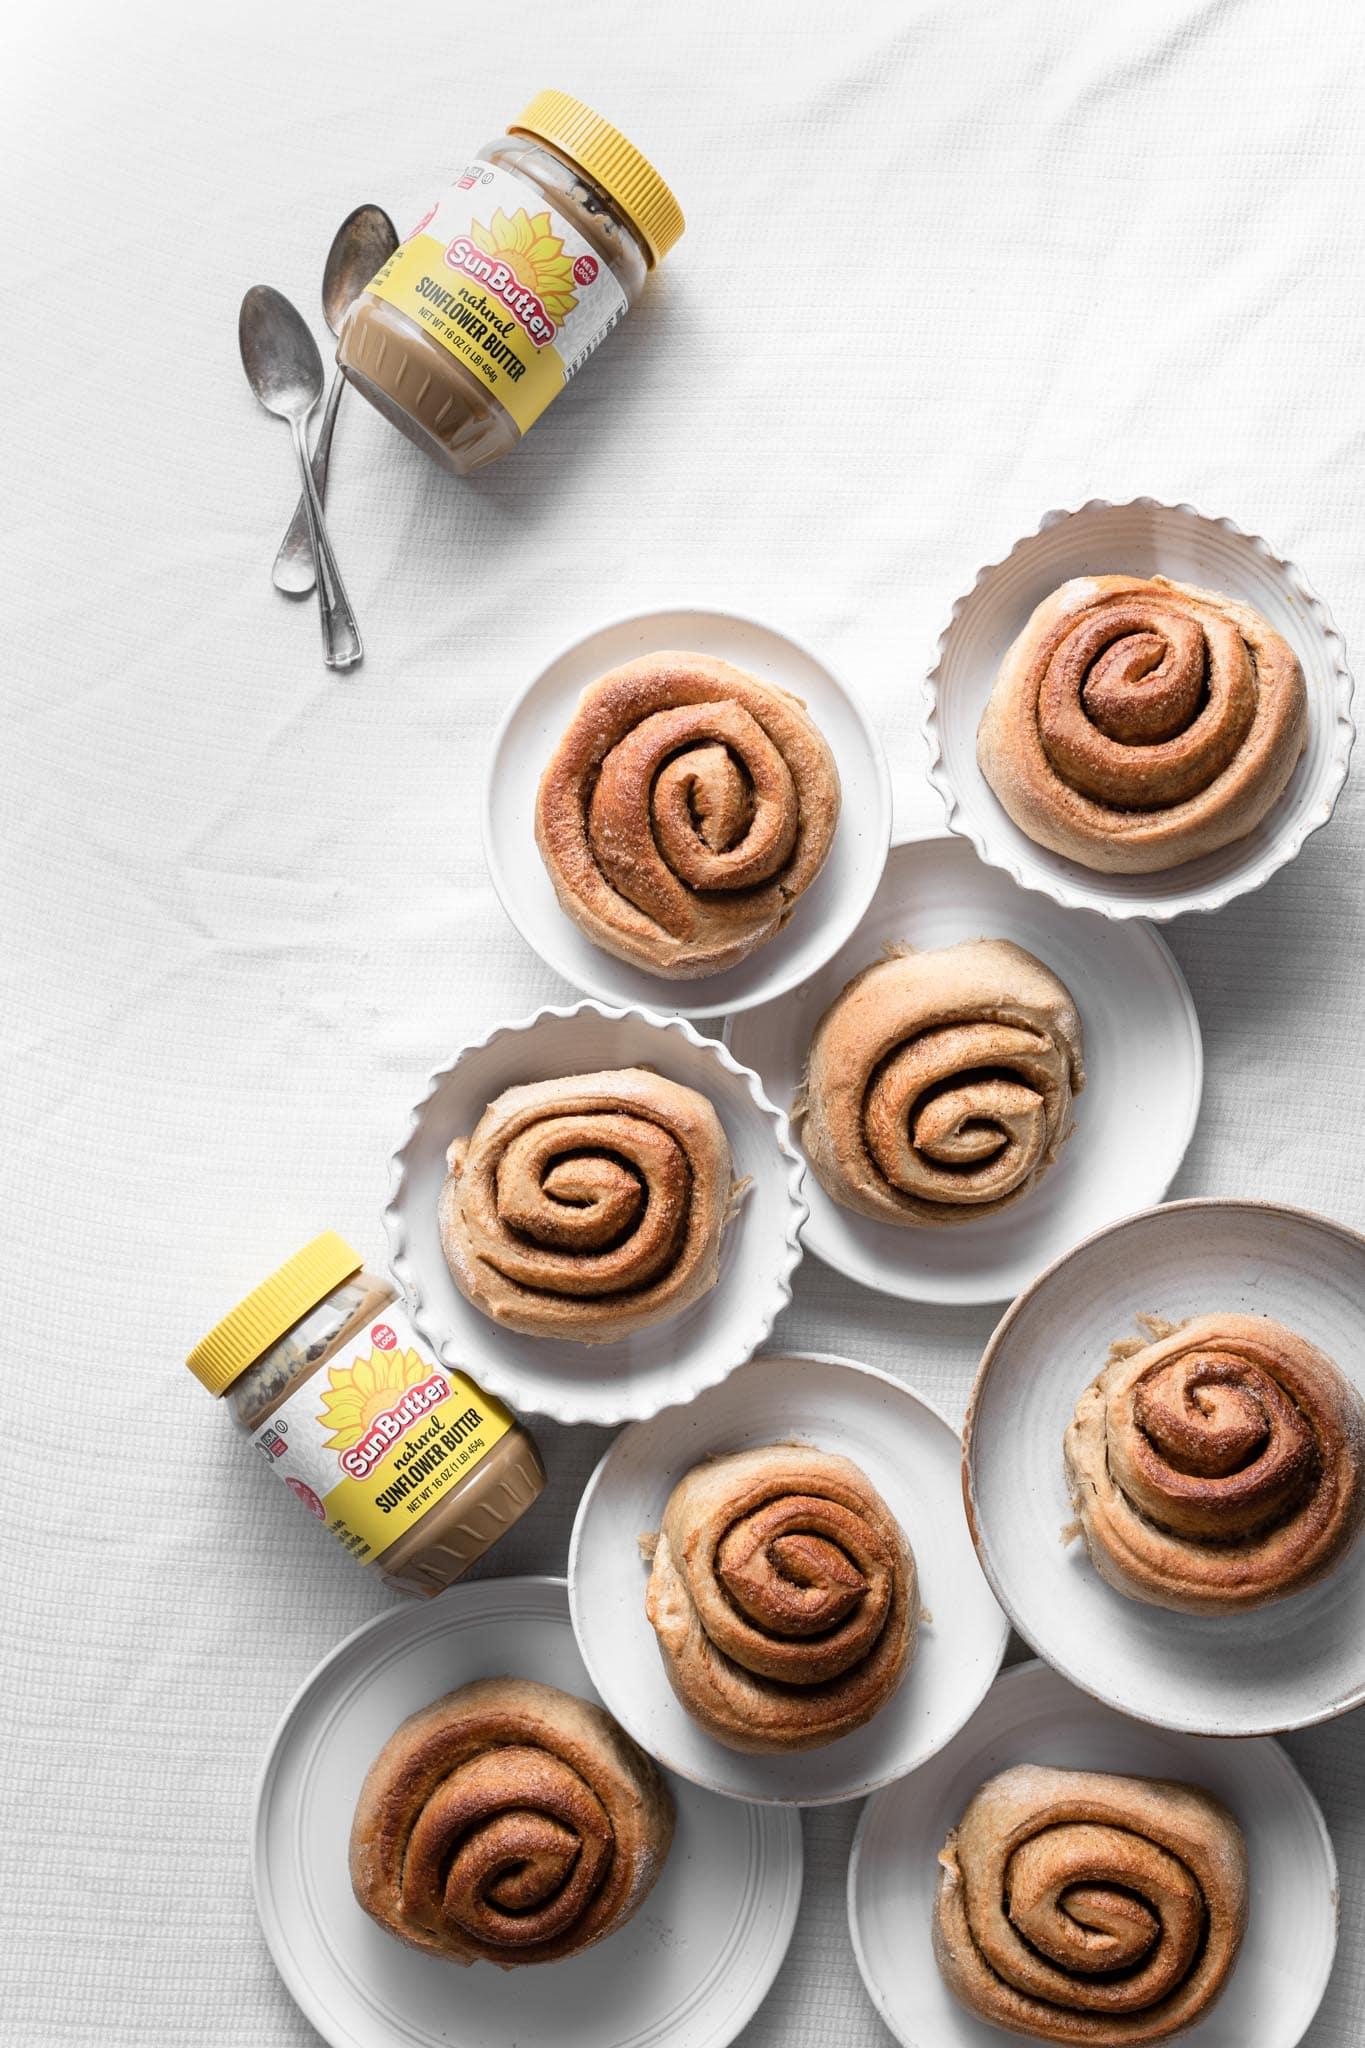 Sunbutter cinnamon rolls recipe